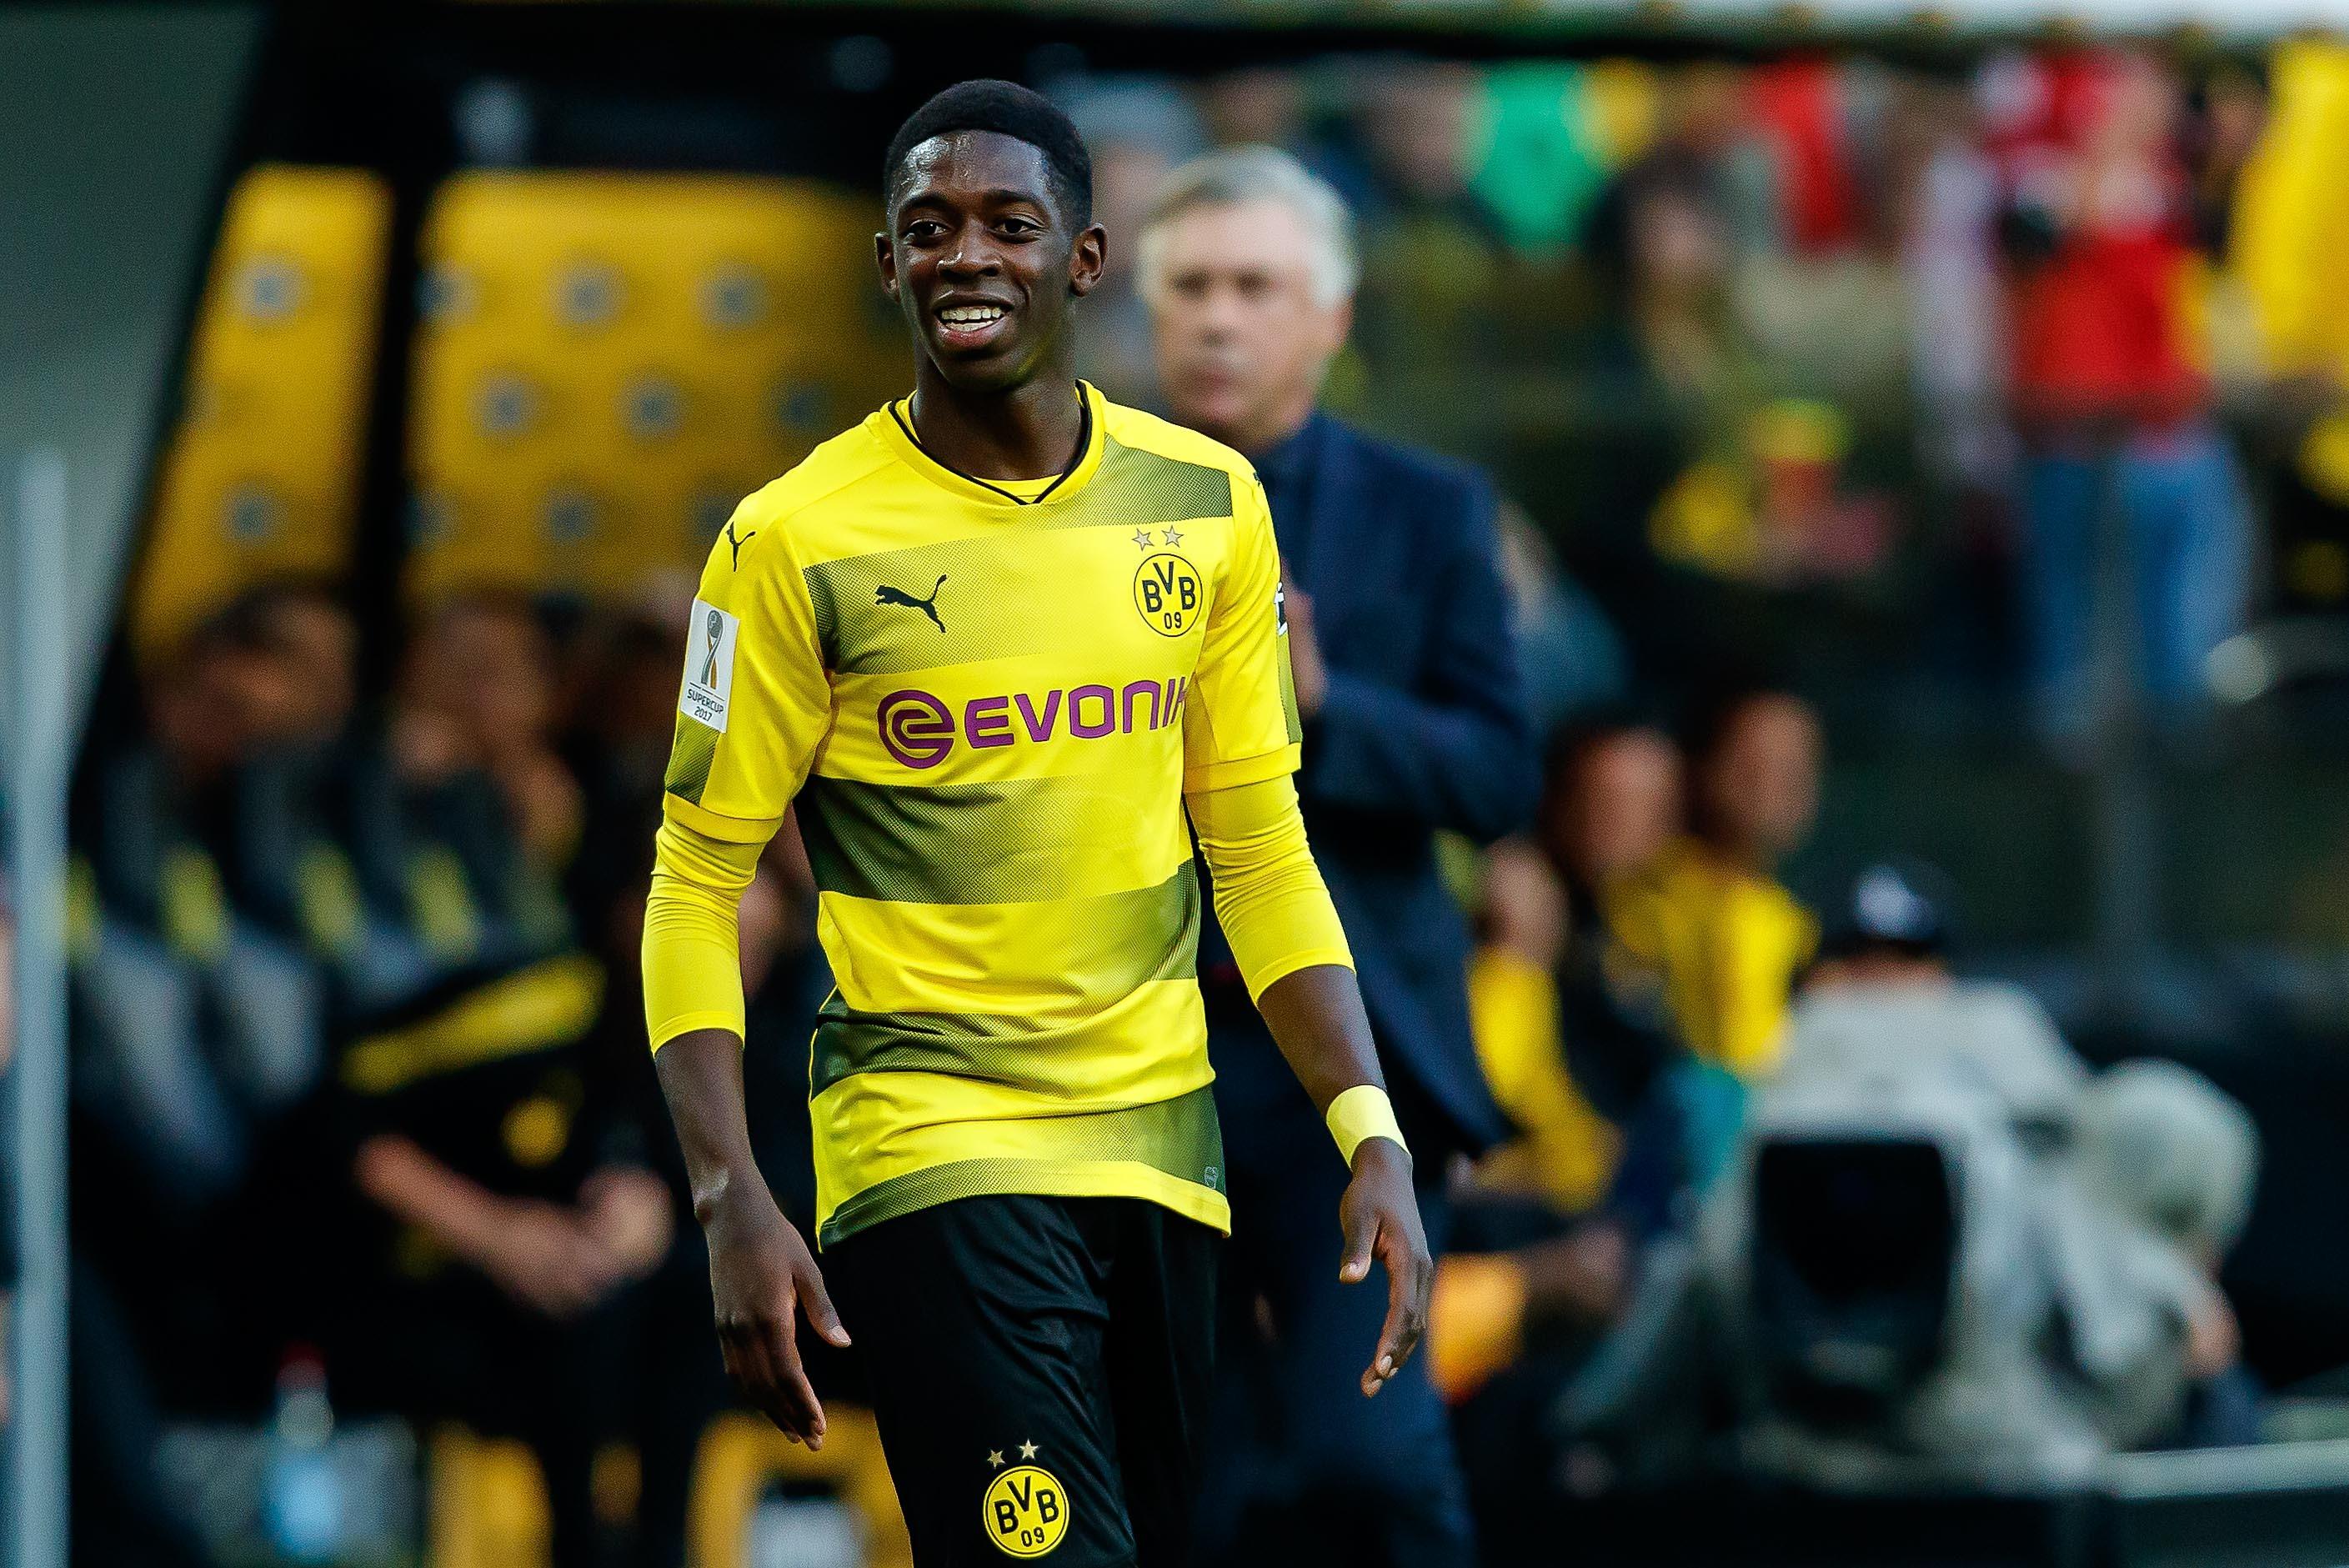 Barcelona Transfer News: Ousmane Dembele Comments Amid